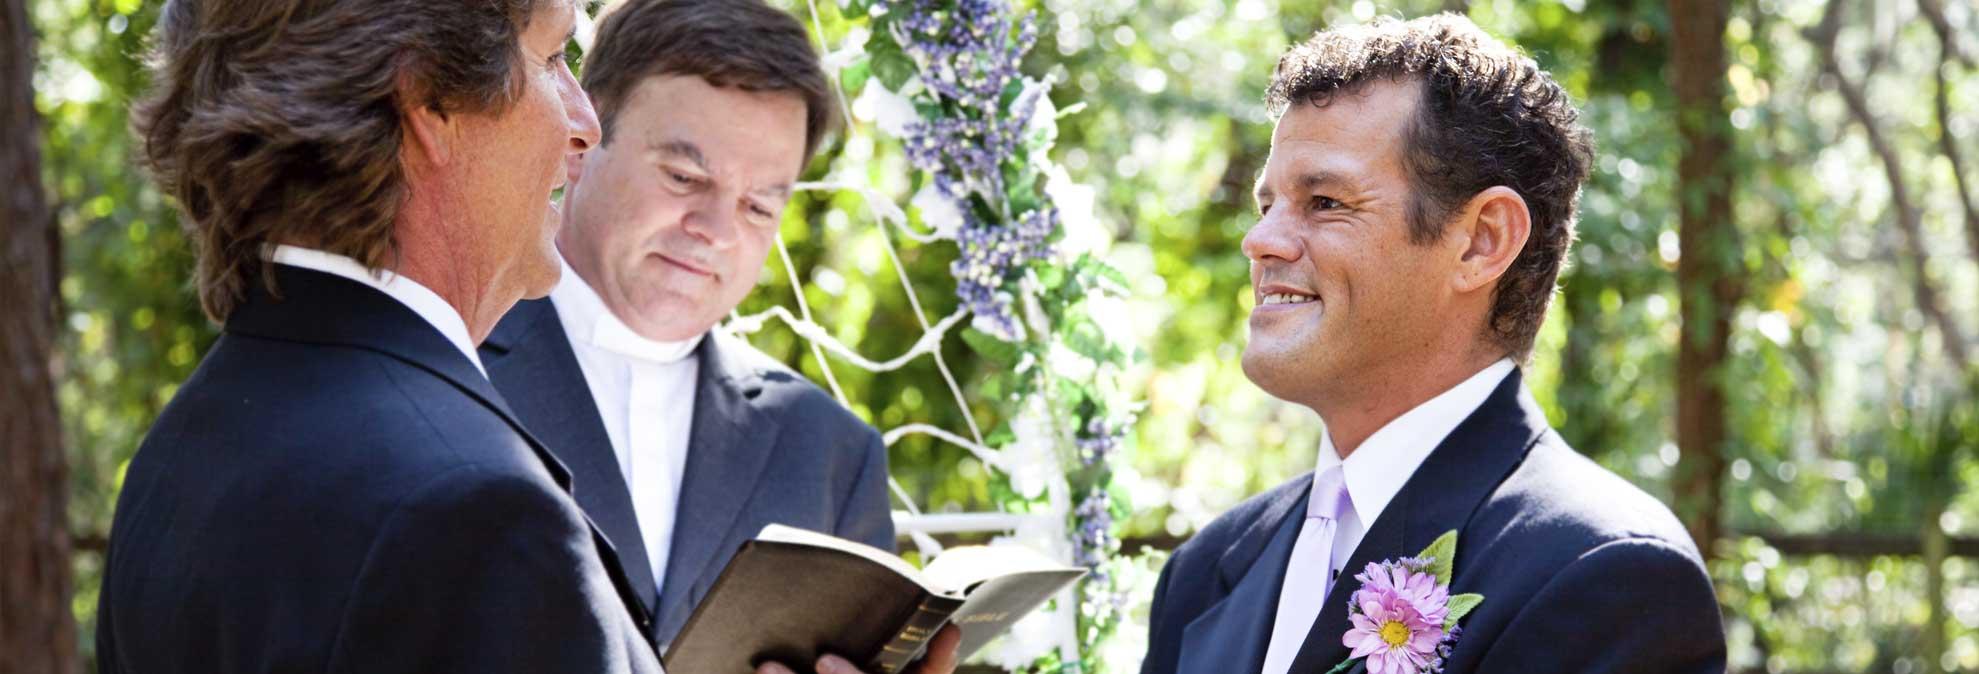 same sex wedding ceremony in Hayward